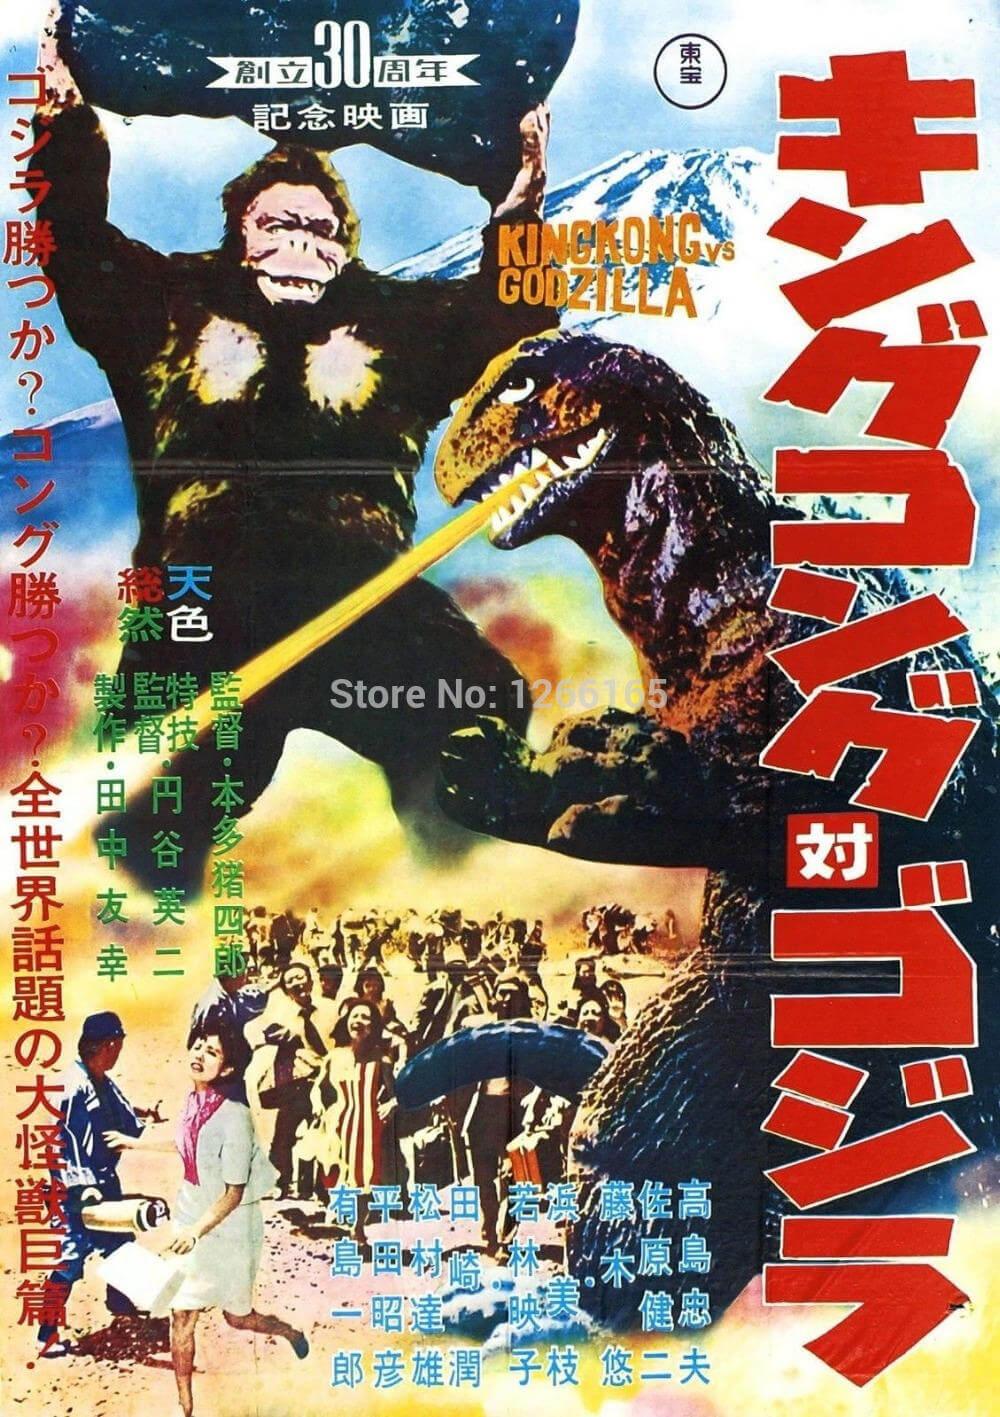 Godzilla rare awesome posterts oldskull 12